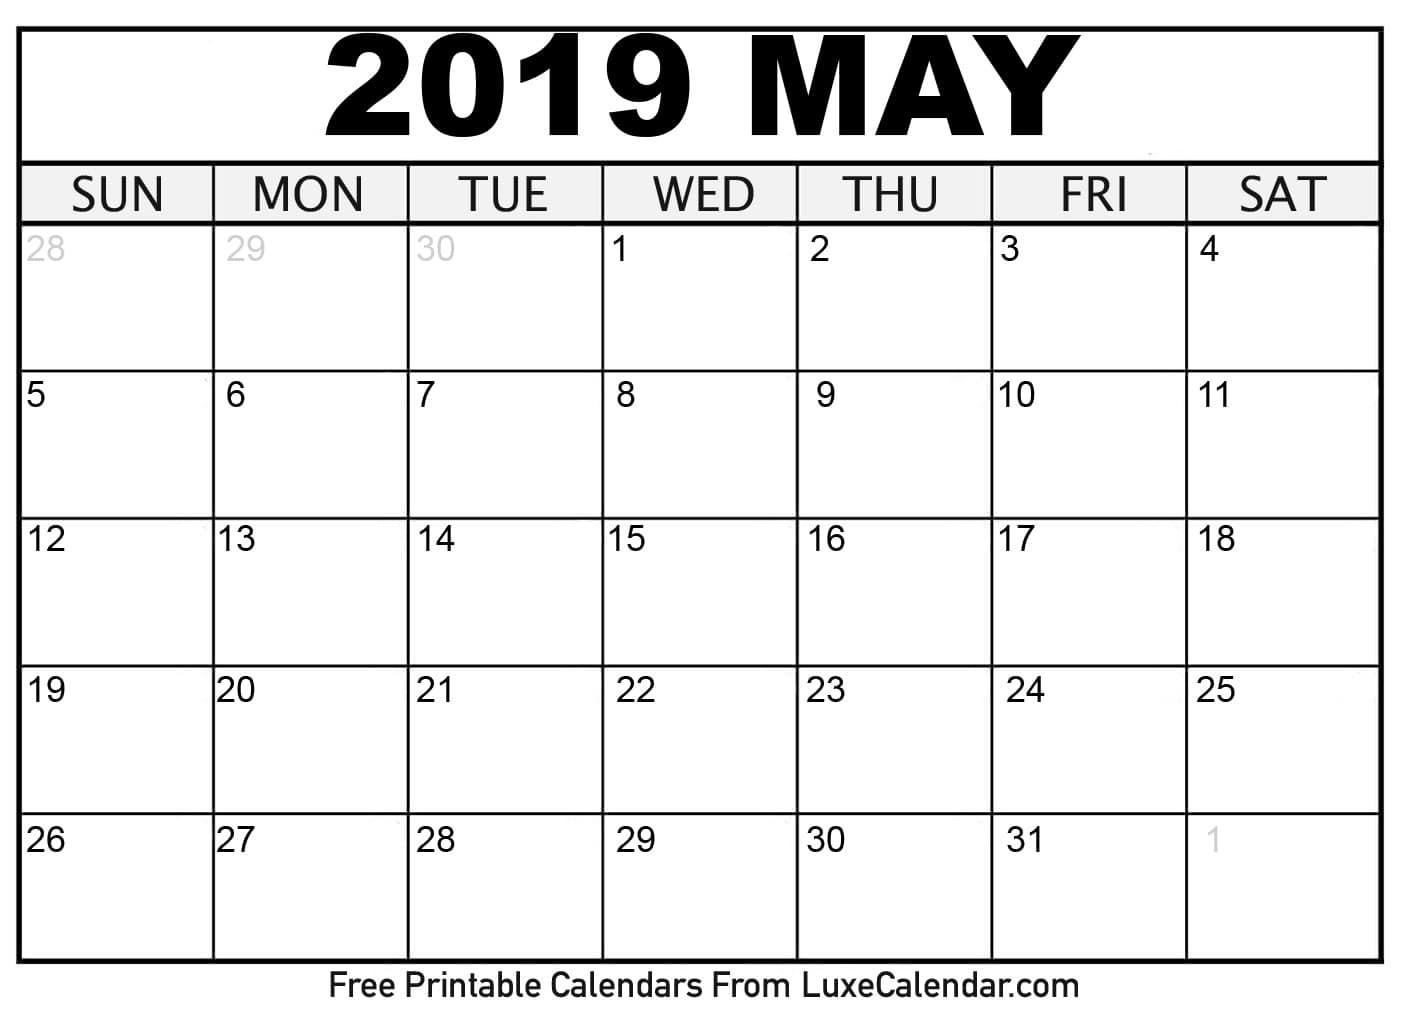 Calendars 2019 Printable